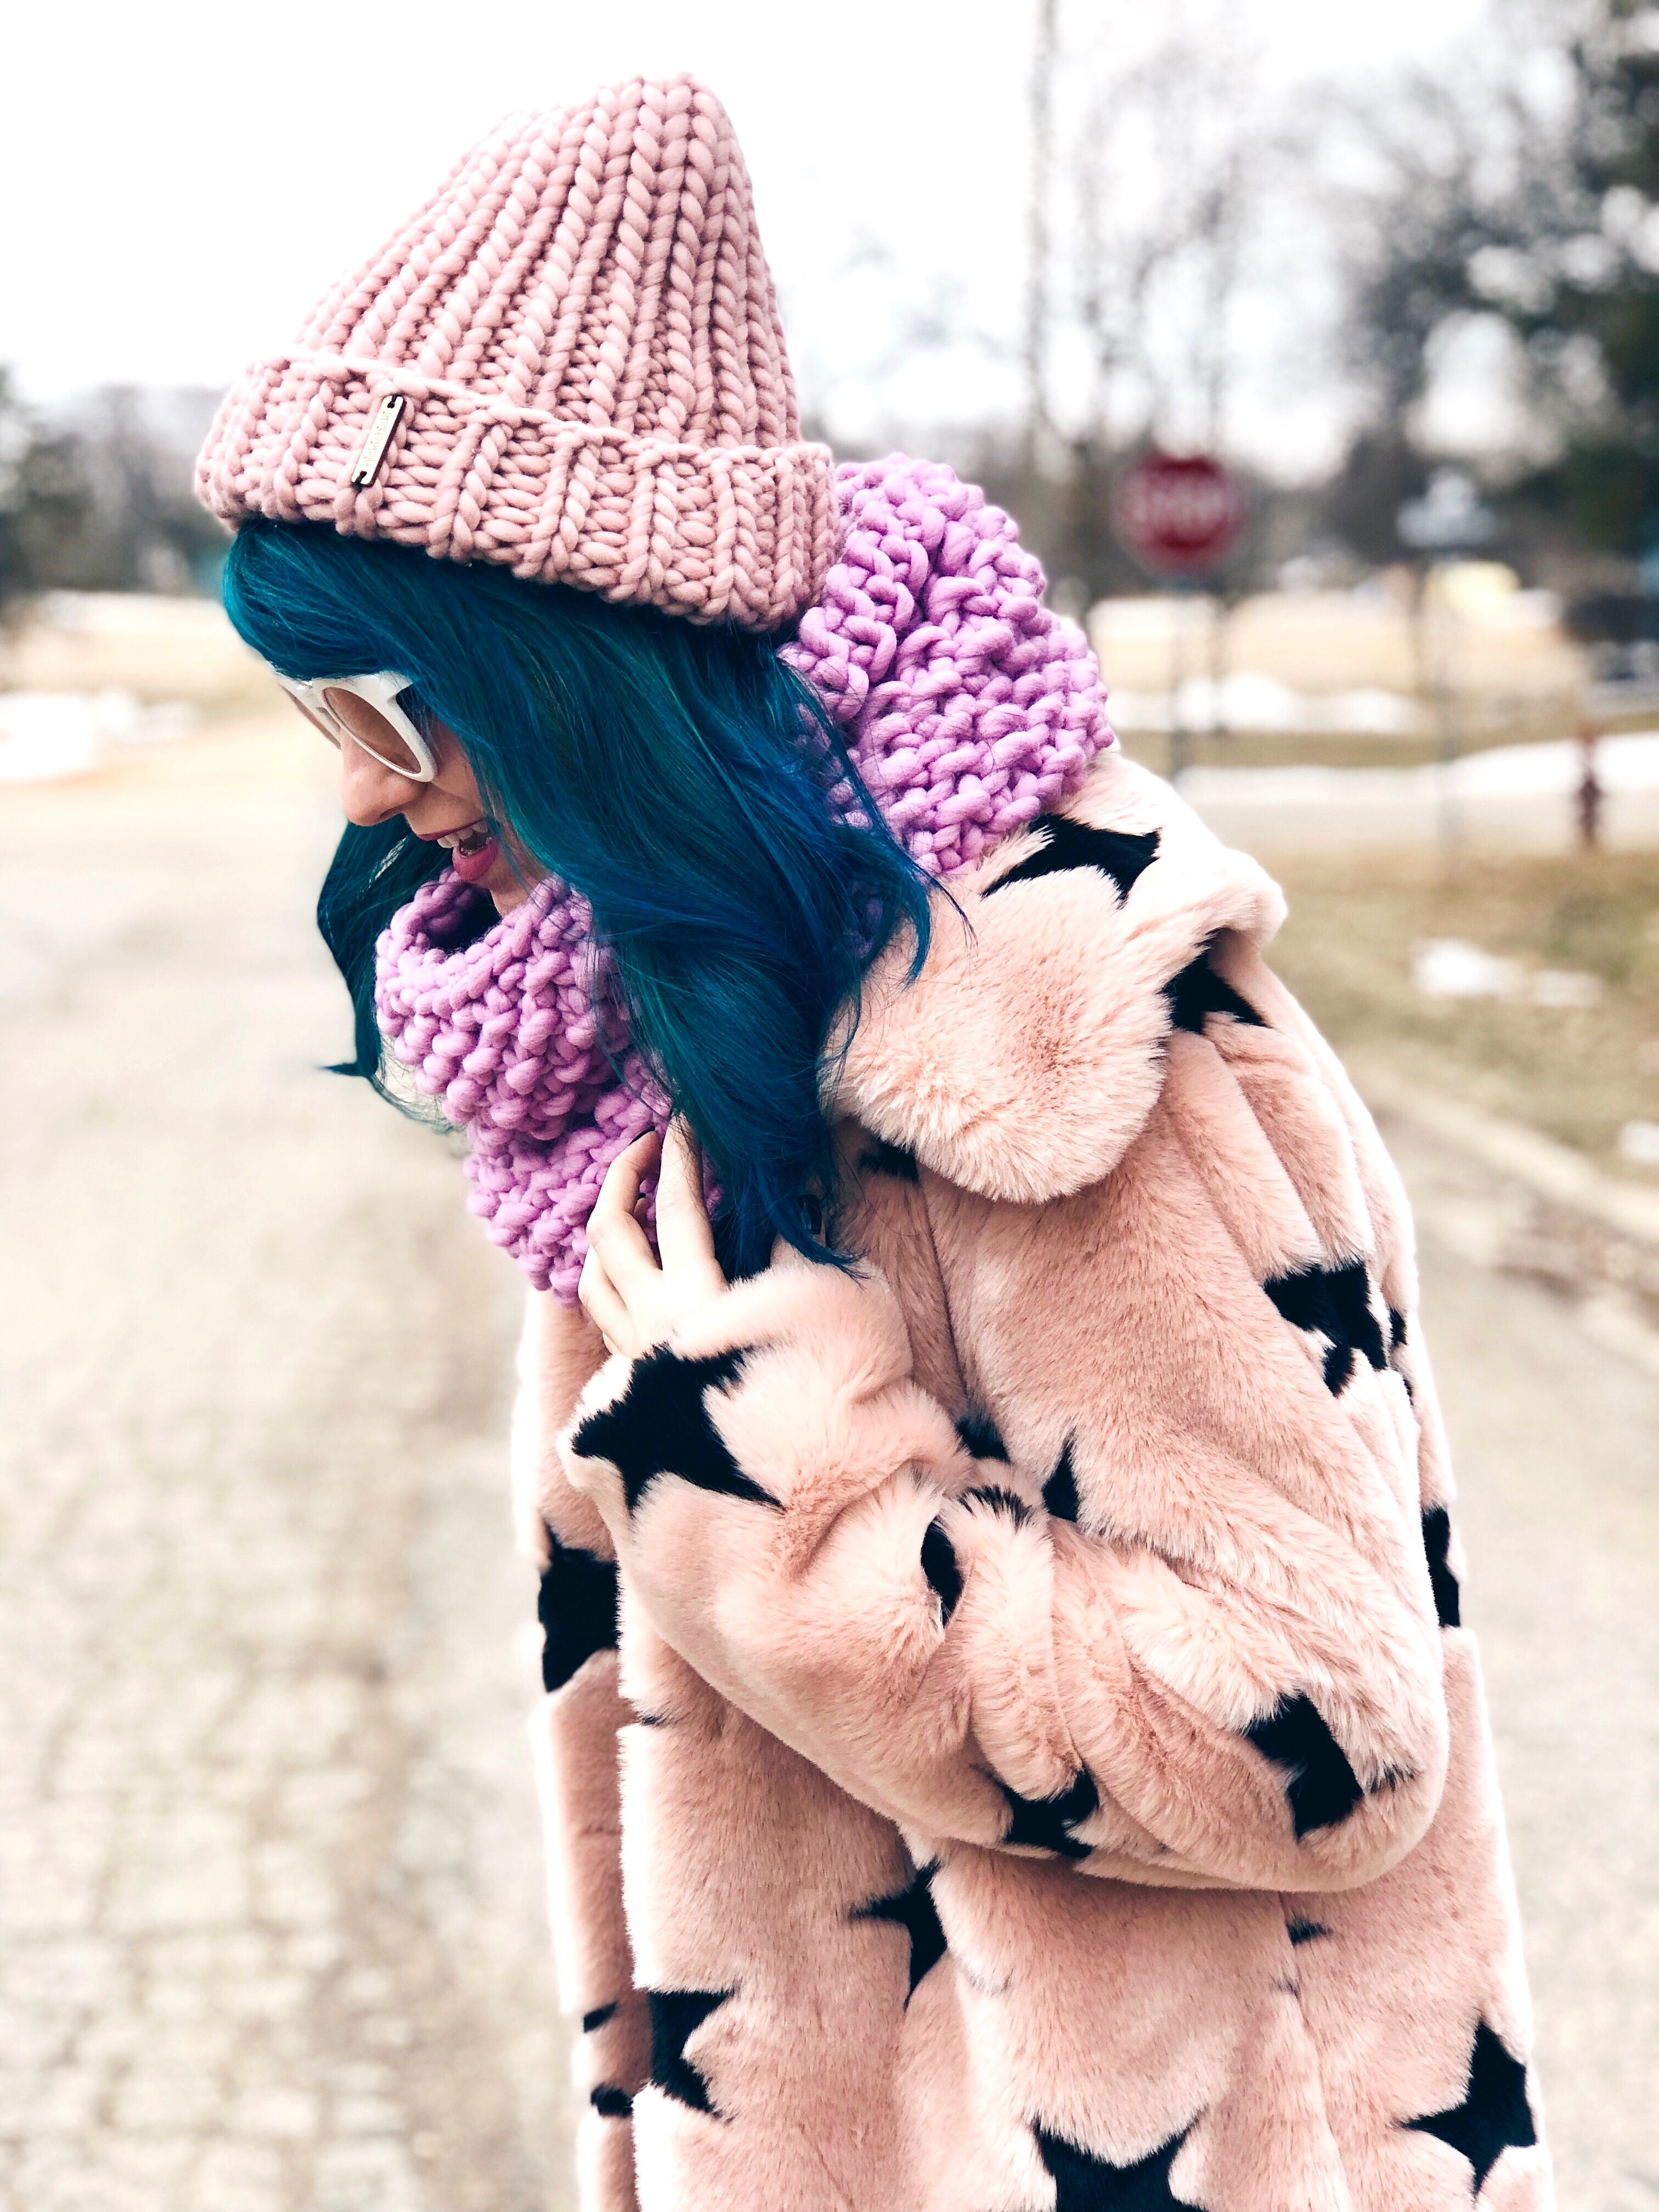 Pastel merino wool knitwear.  Nickichicki Bubble Fluff Cowl And Ribbed  Beanie. Women s winter fashion style 2018. Fun kawaii style outfit. b9218d7e229f